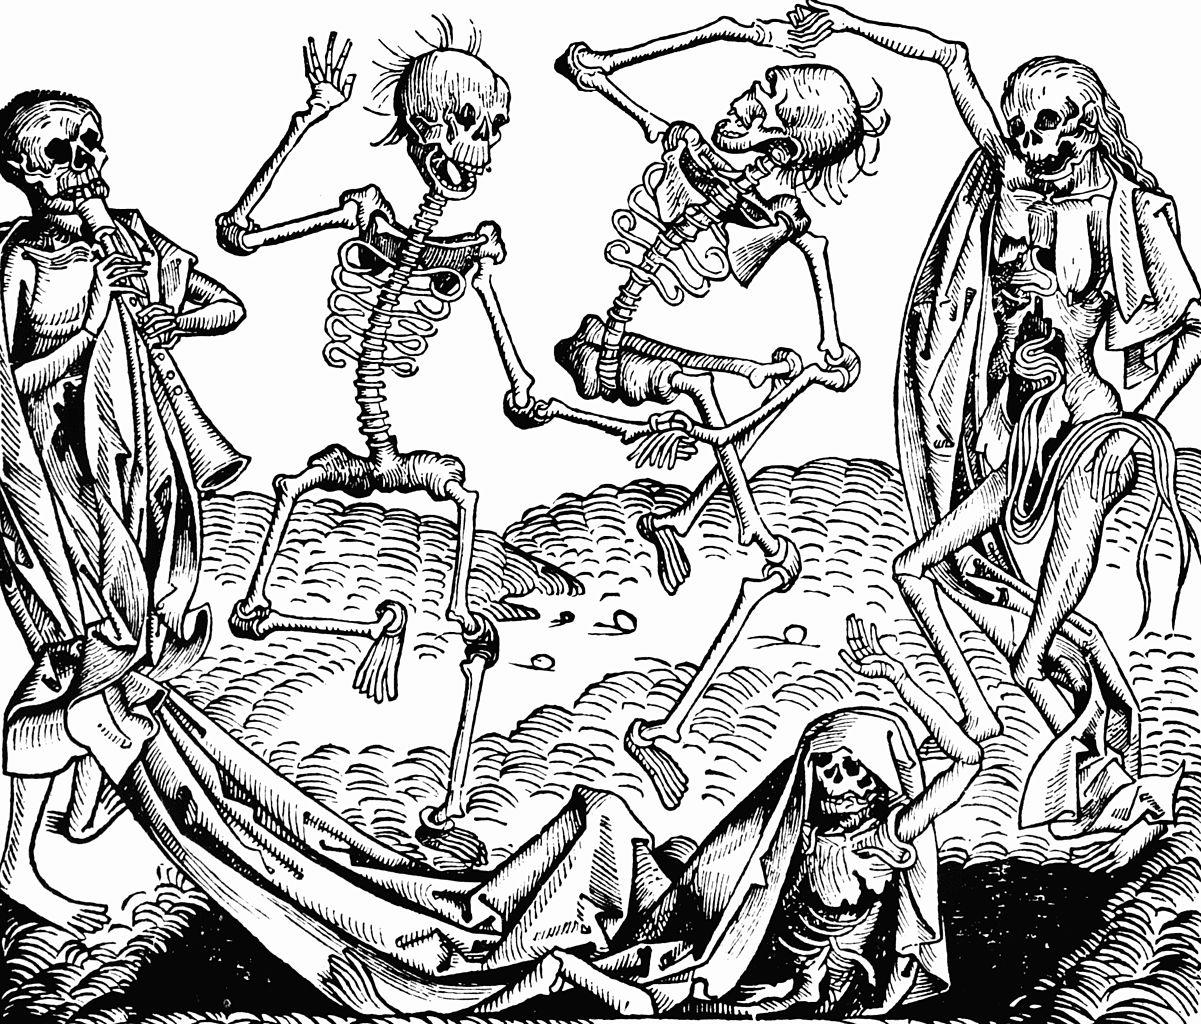 01. Nuremberg chronicles – Dance of Death. 1493